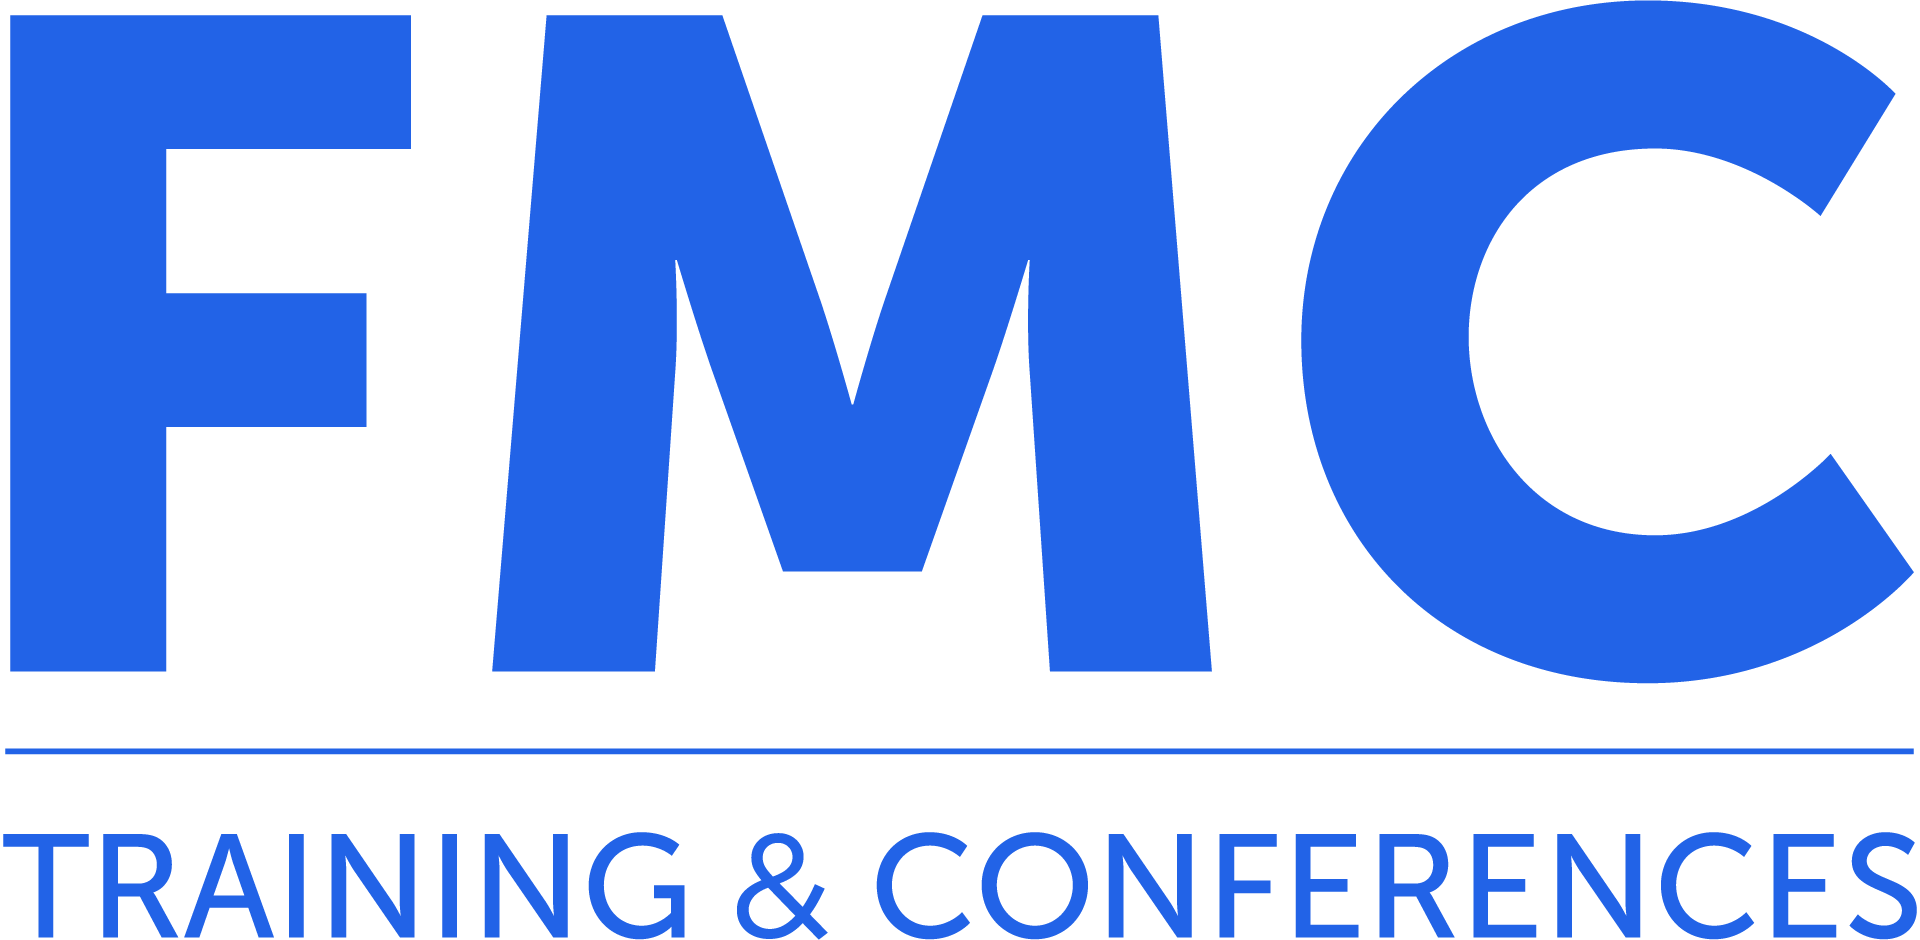 Future Media Concepts - Training & Conferences logo